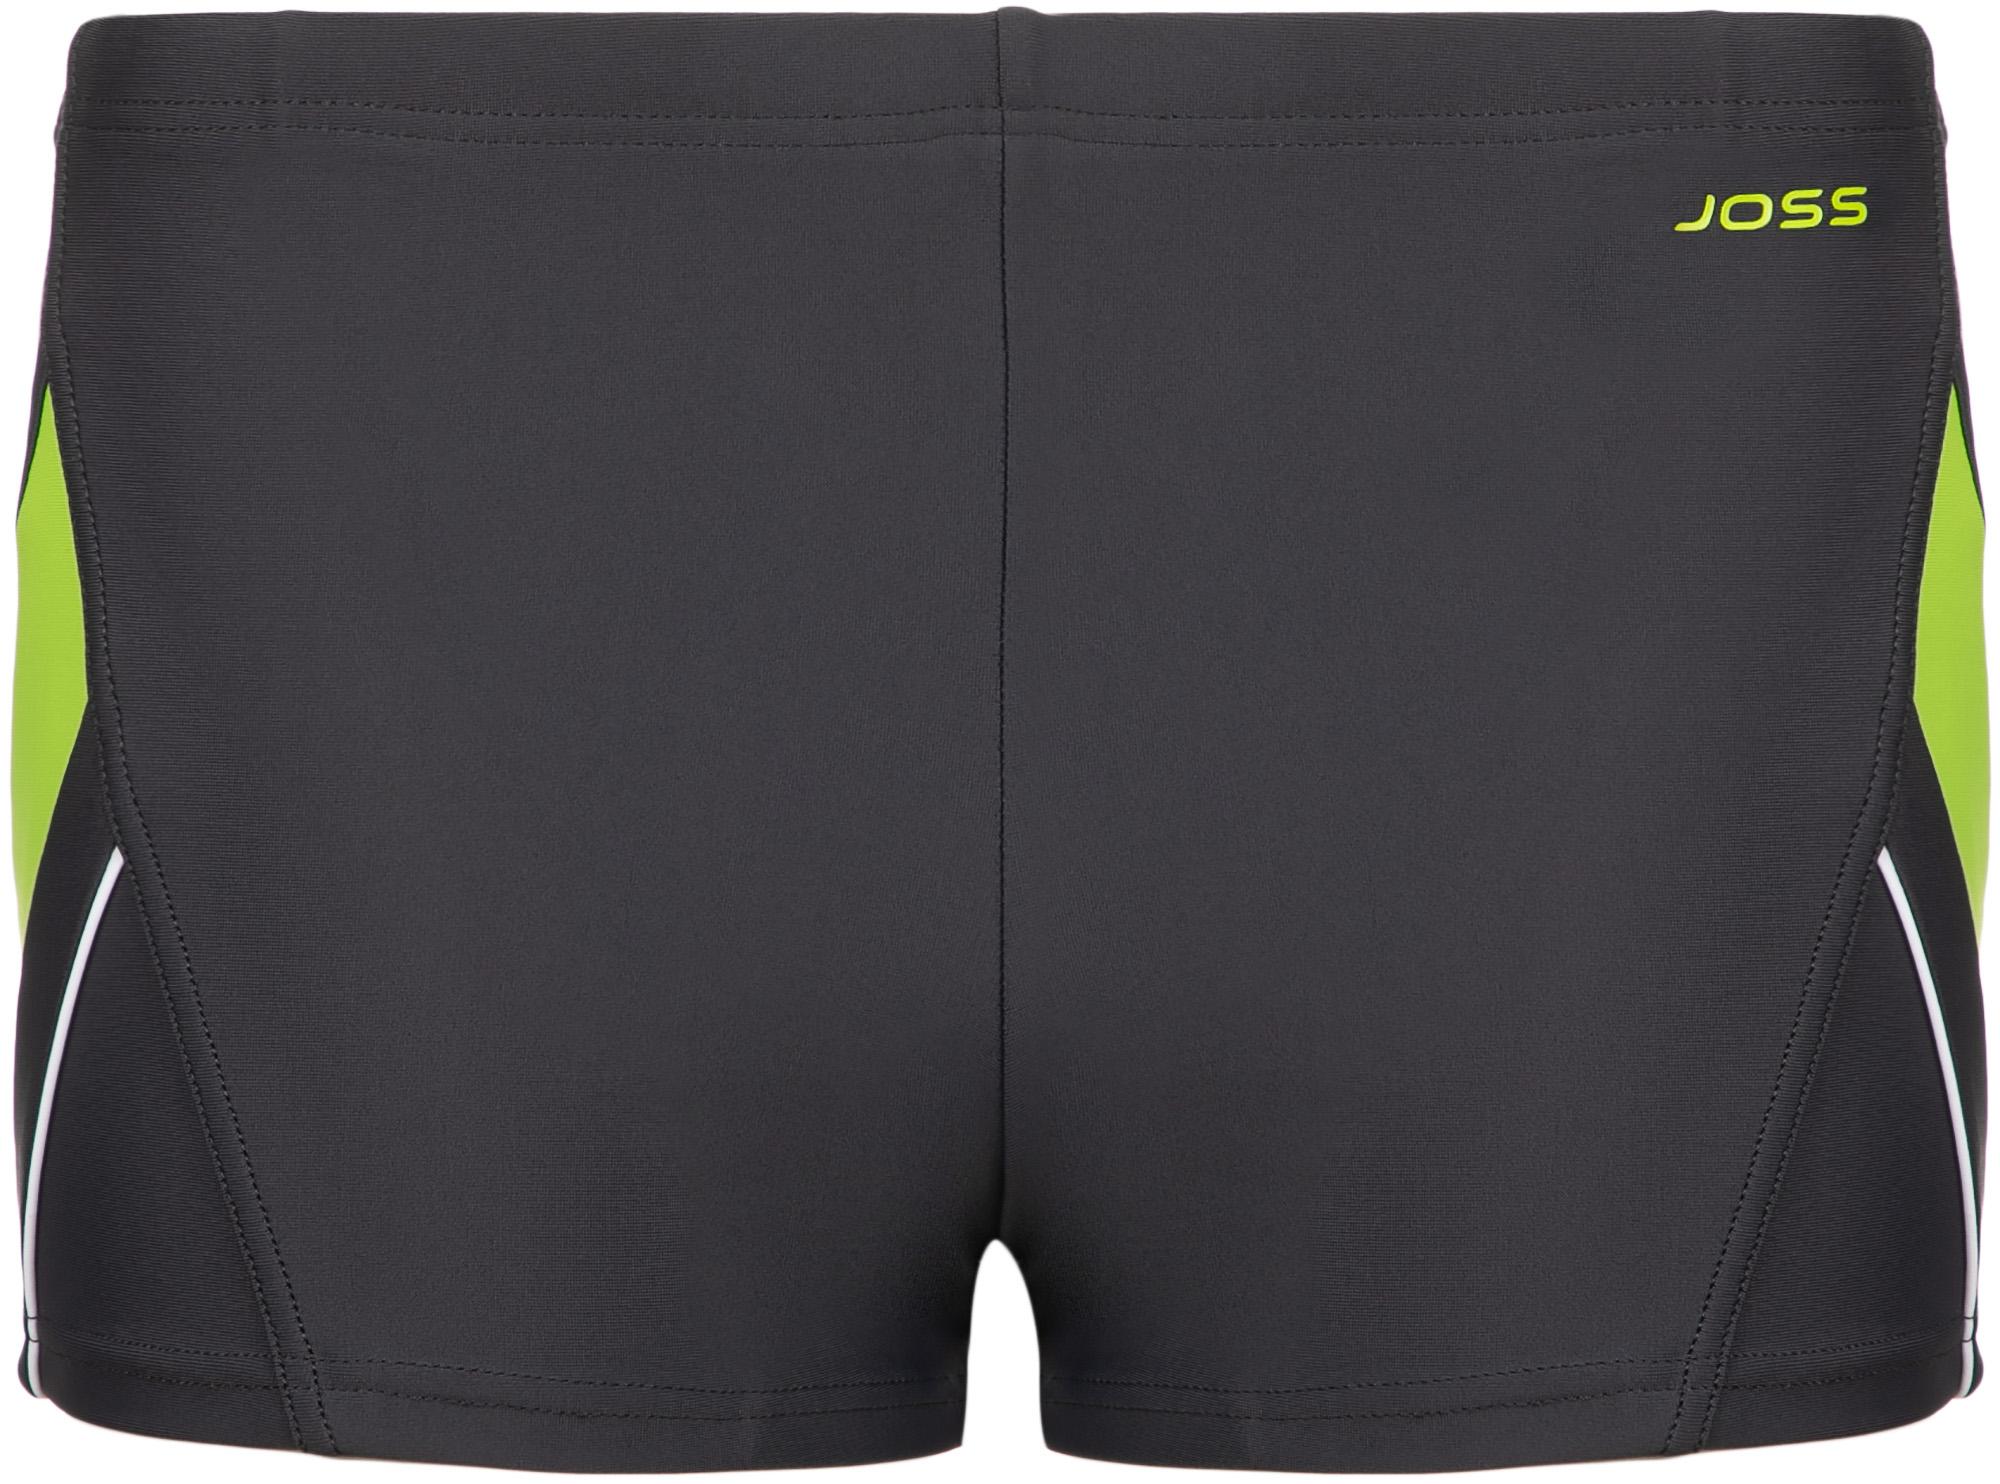 Joss Плавки-шорты для мальчиков Joss, размер 140 joss плавки для мальчиков joss размер 128